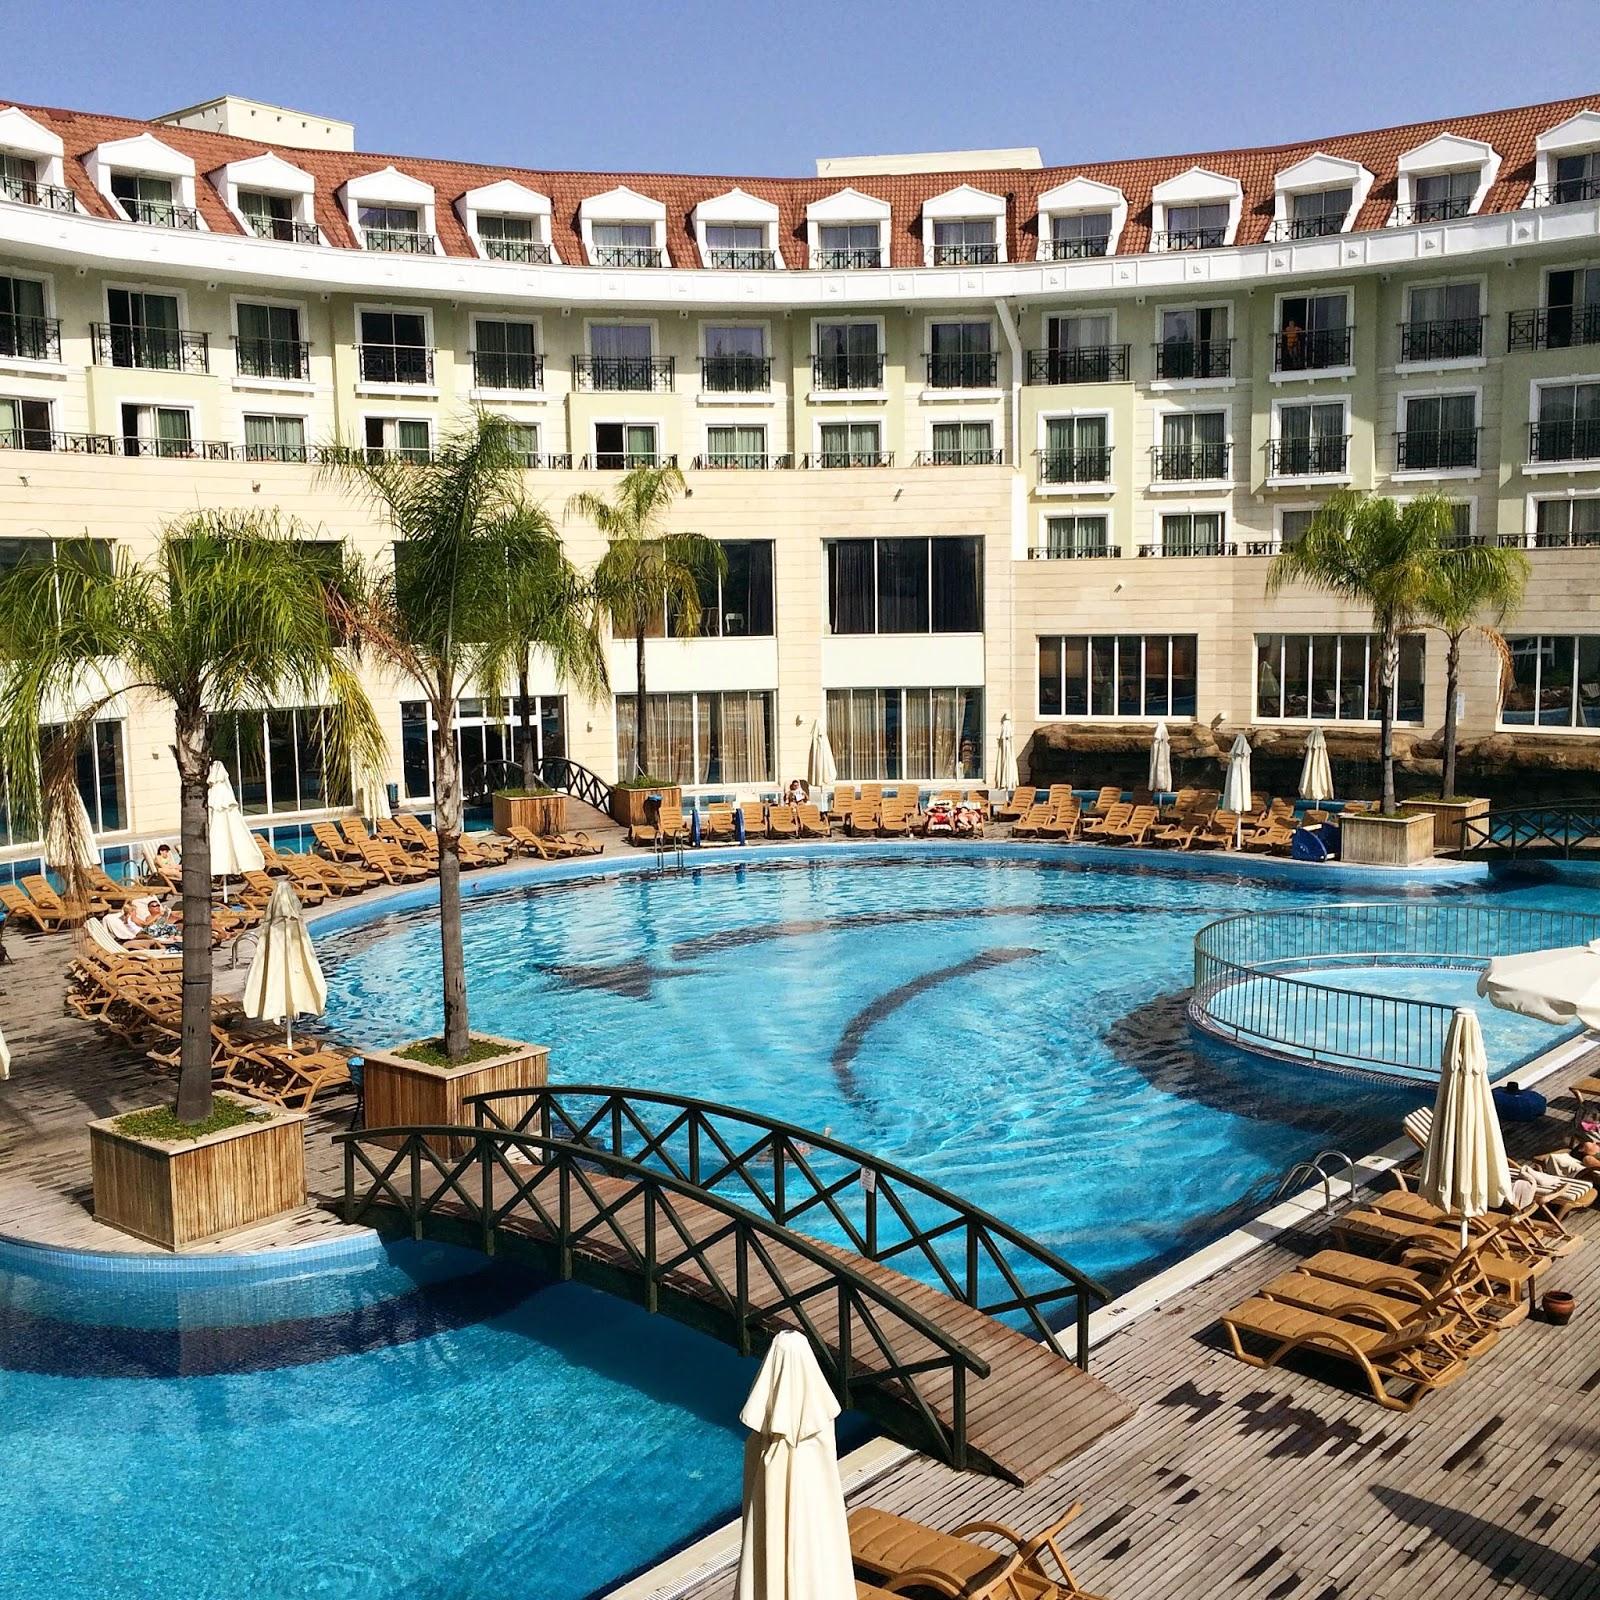 meder-resort-hotel-kemer-turkey